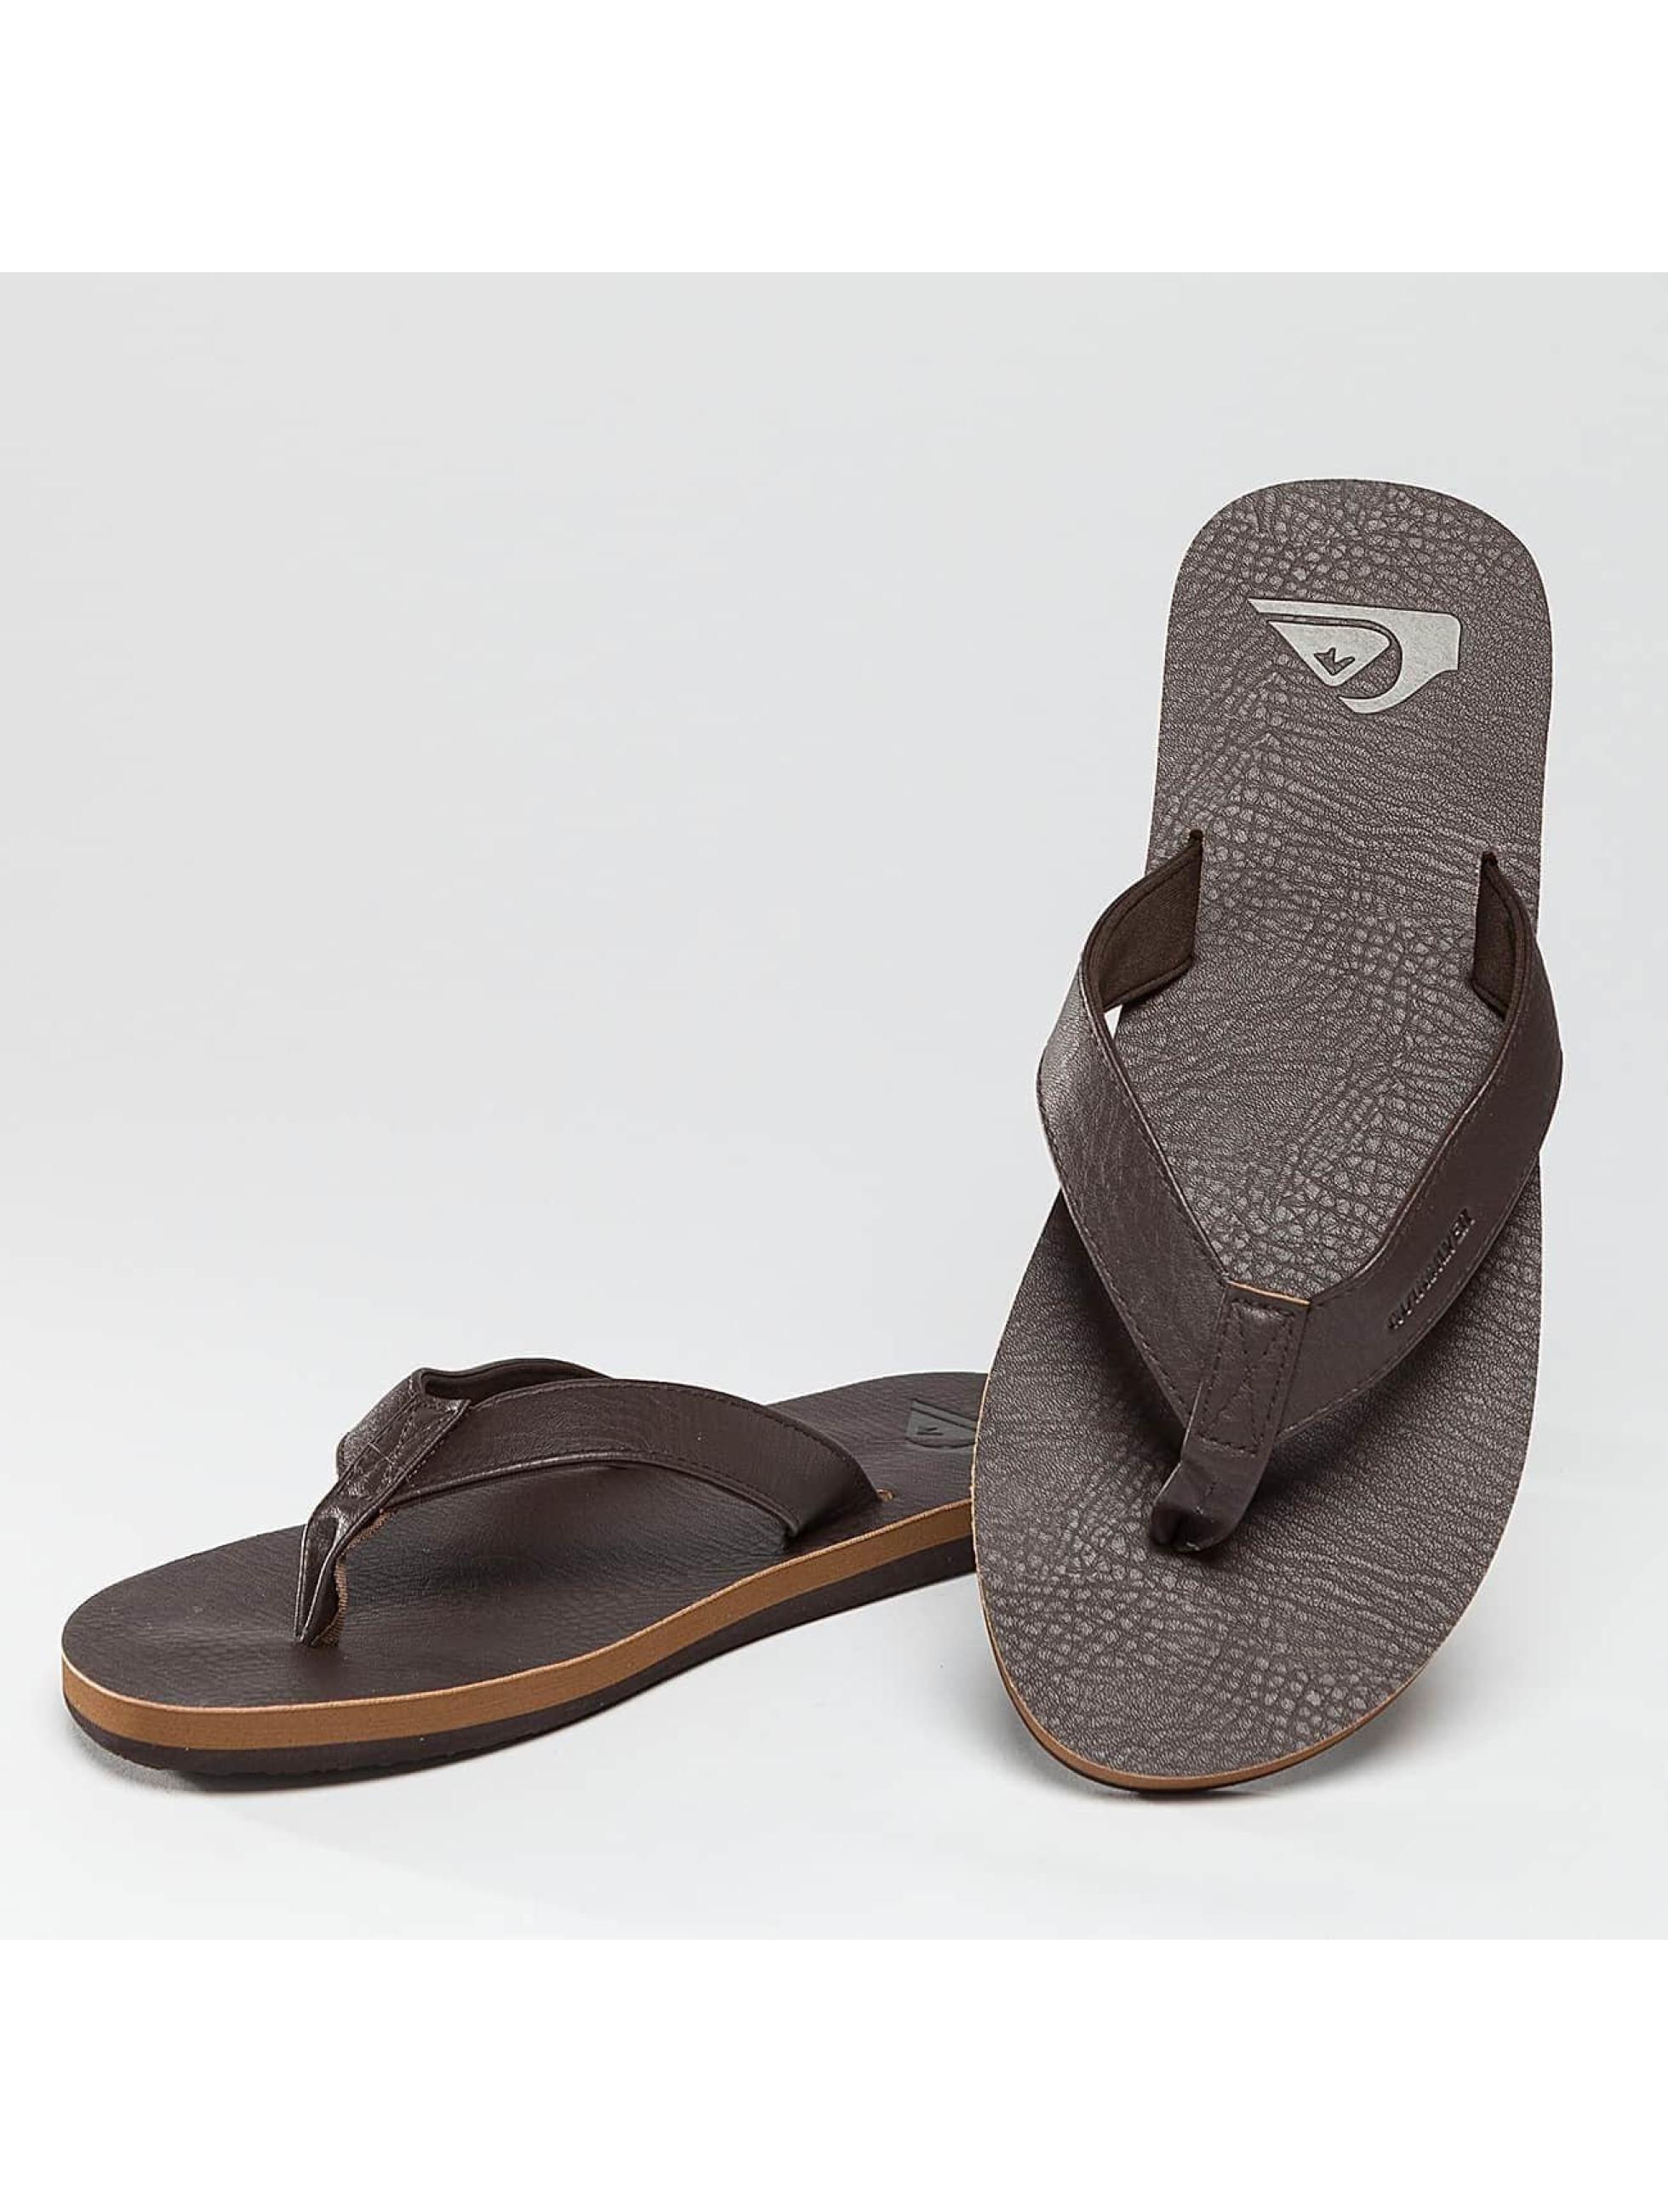 Quiksilver Chaussures / Sandales Molokai Nubuck en brun